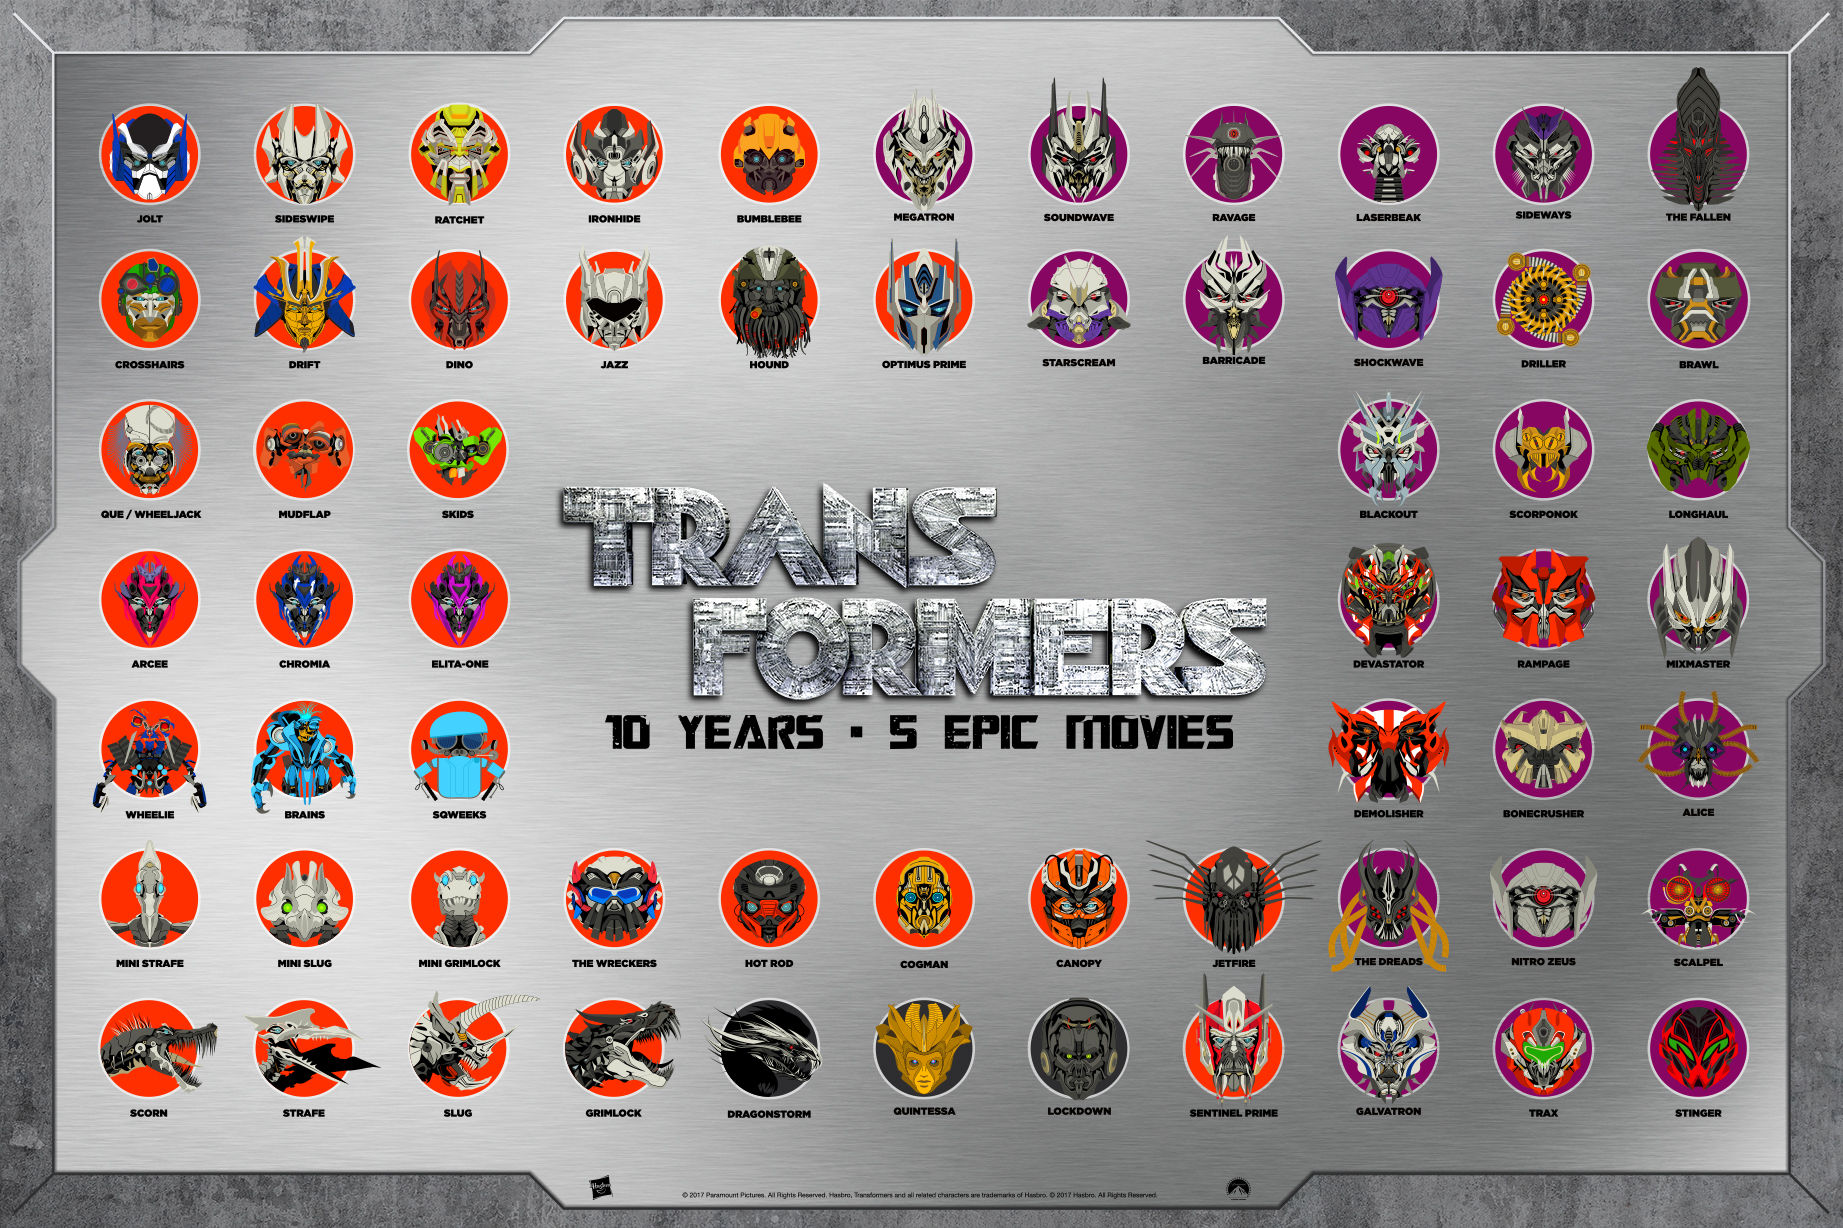 Transformers 10th anniversary & the last knight tribute digital